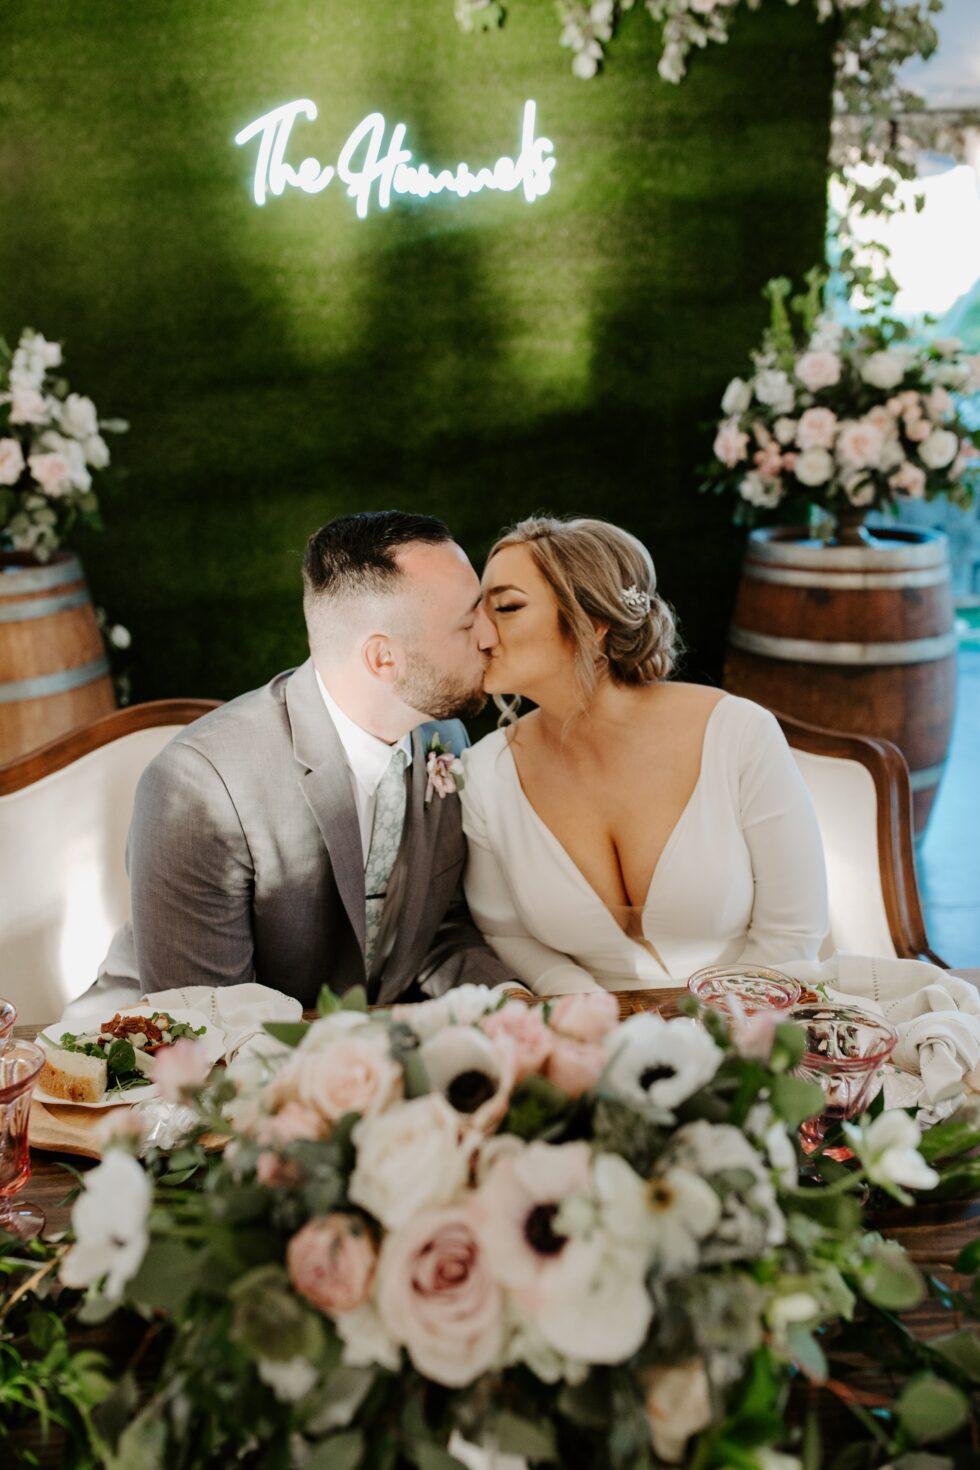 Spring-Wedding-at-Summerfield-Farms-Rachel-and-Brian-67